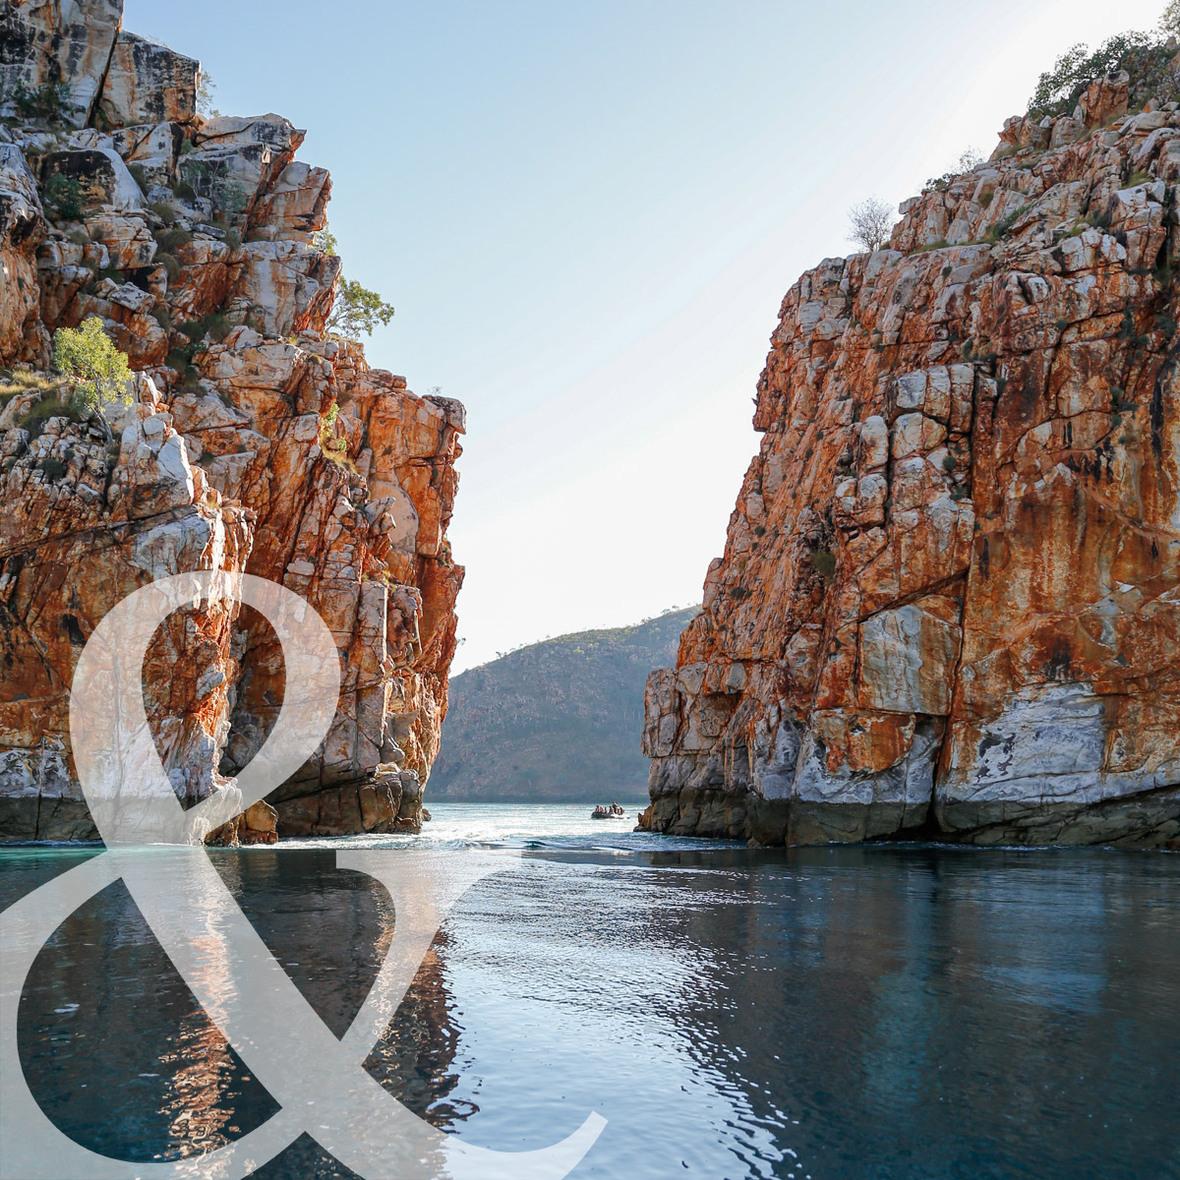 Kimberley-2-Social-media-tiles 002